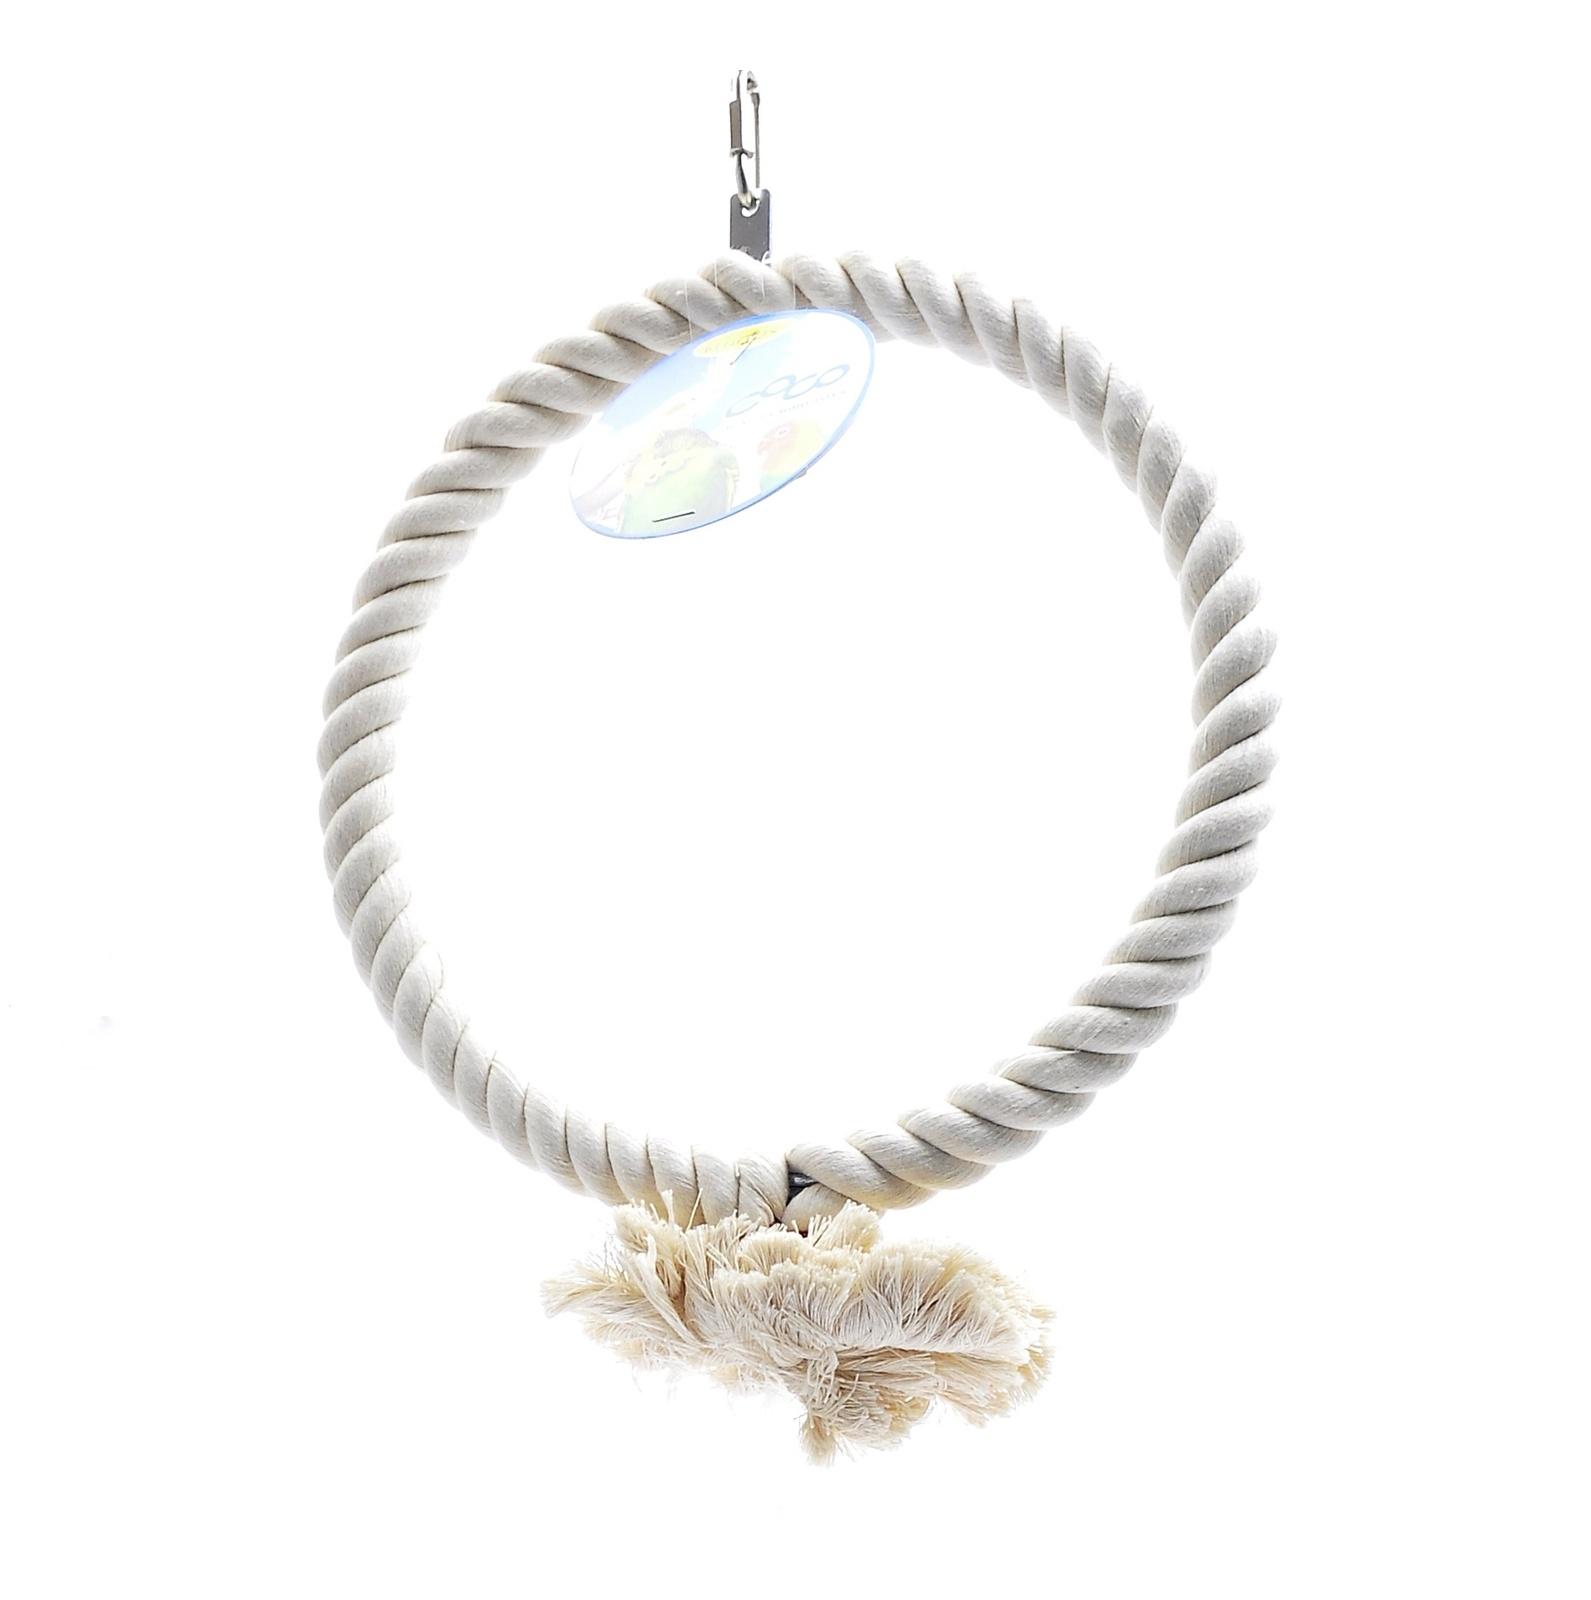 "Benelux Игрушка для птиц ""Большое кольцо"" 27 см (Coco big toy 1 ring 27 cm) 14440 от Ravta"